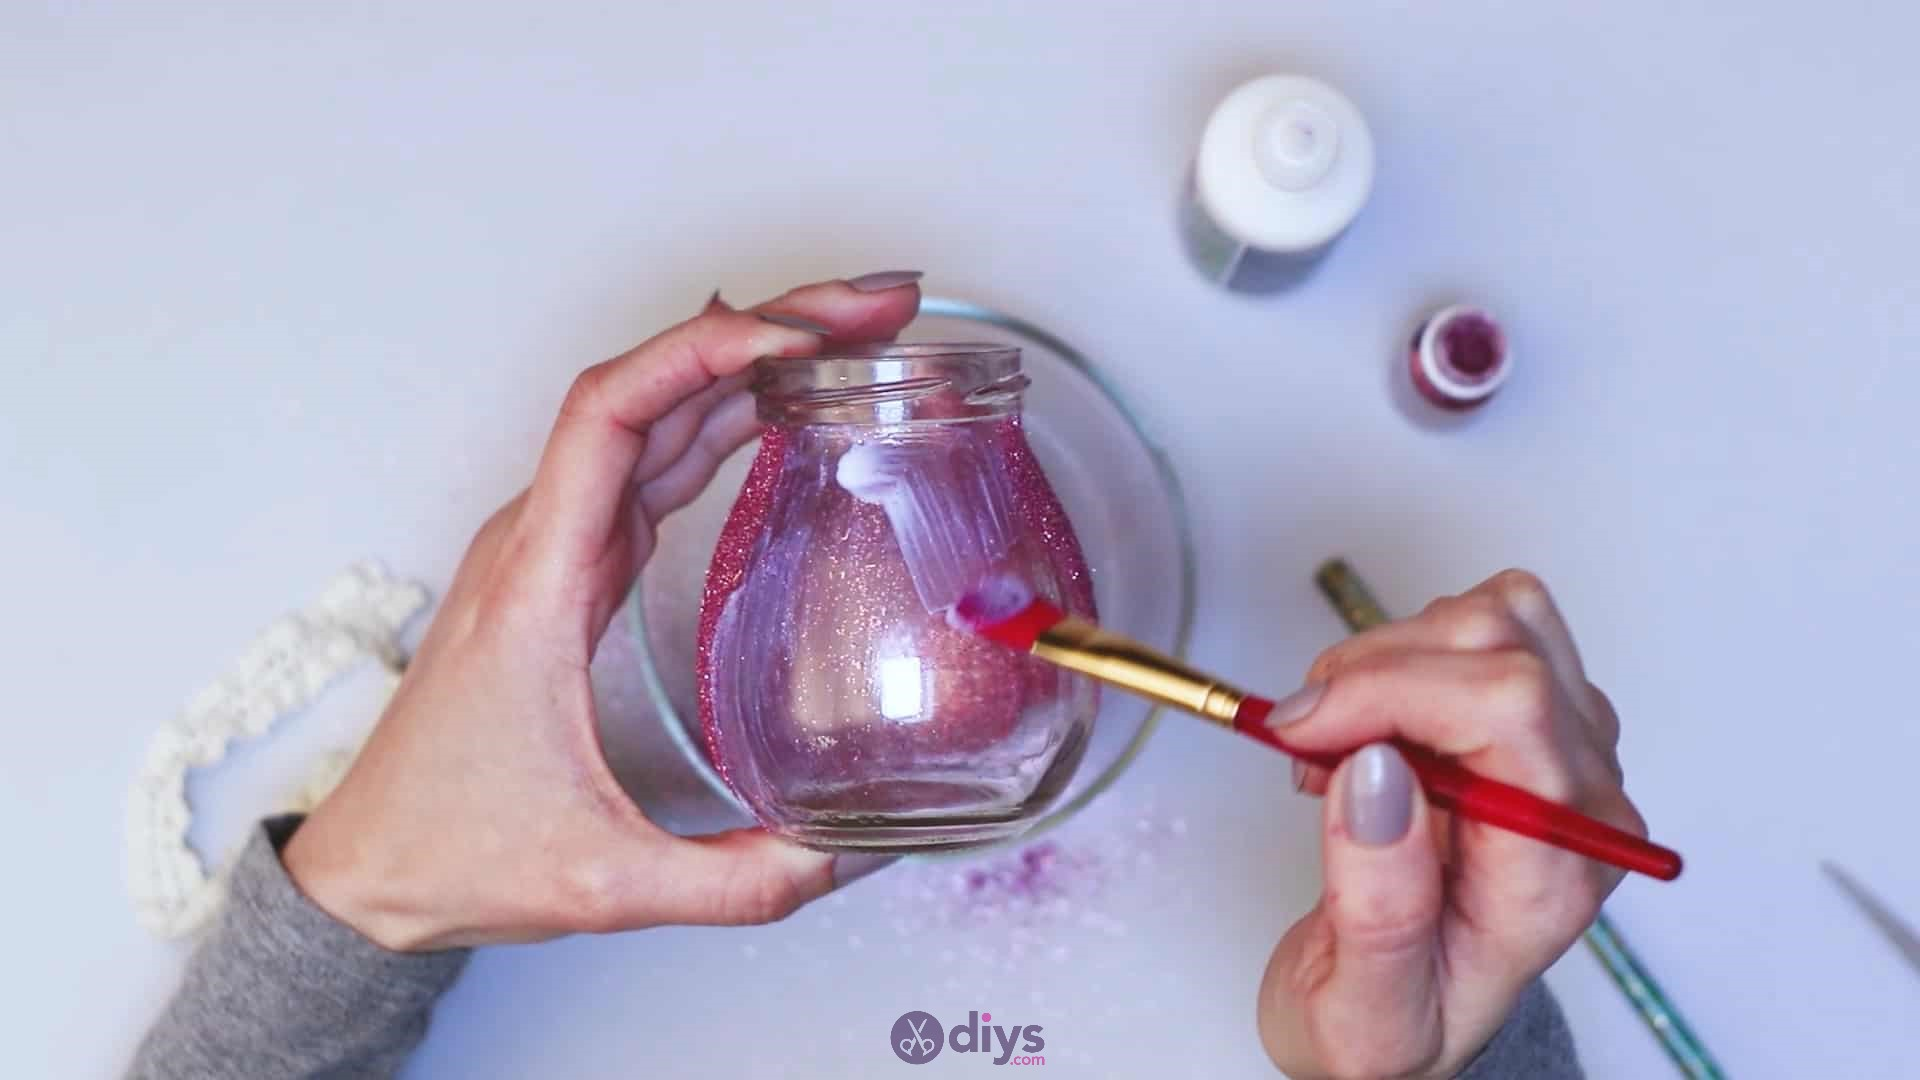 Diy flower glitter vase from glass jars step 6f